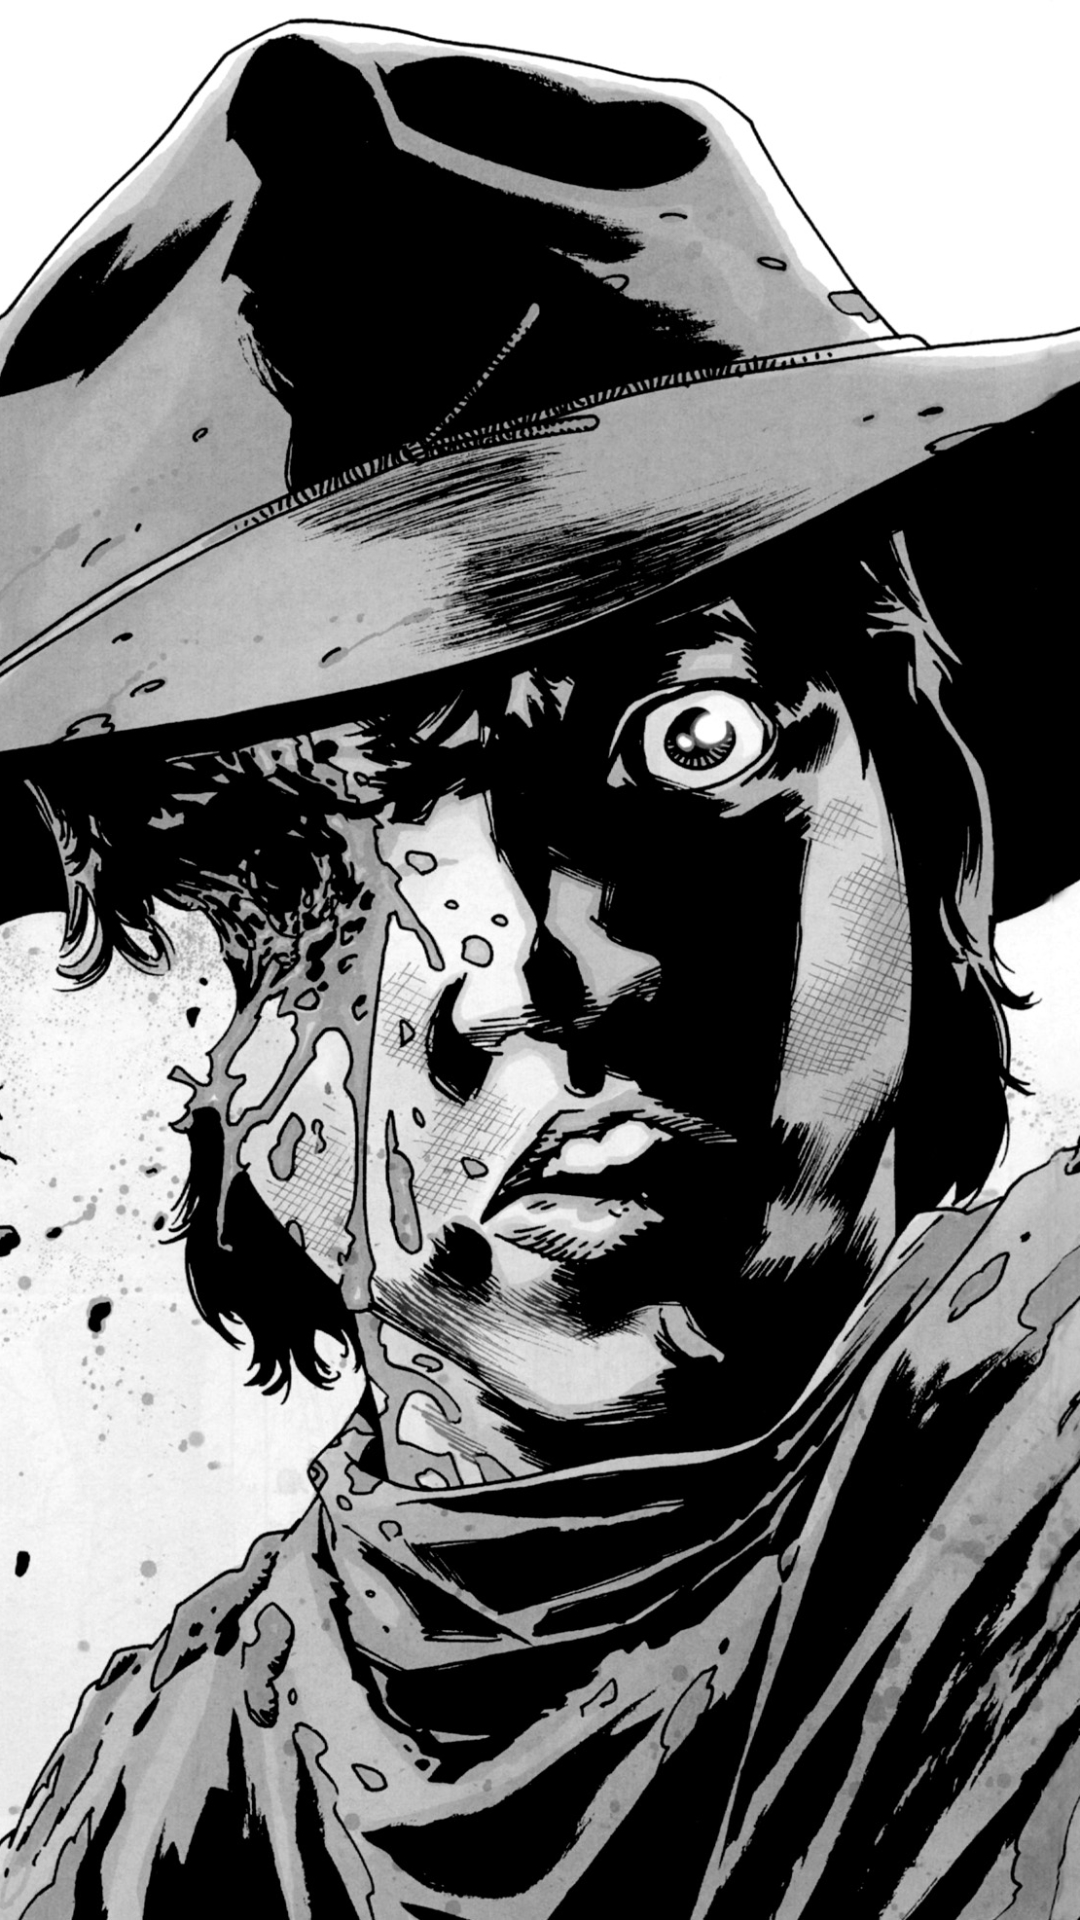 Comics The Walking Dead 1080x1920 Wallpaper Id 687865 Mobile